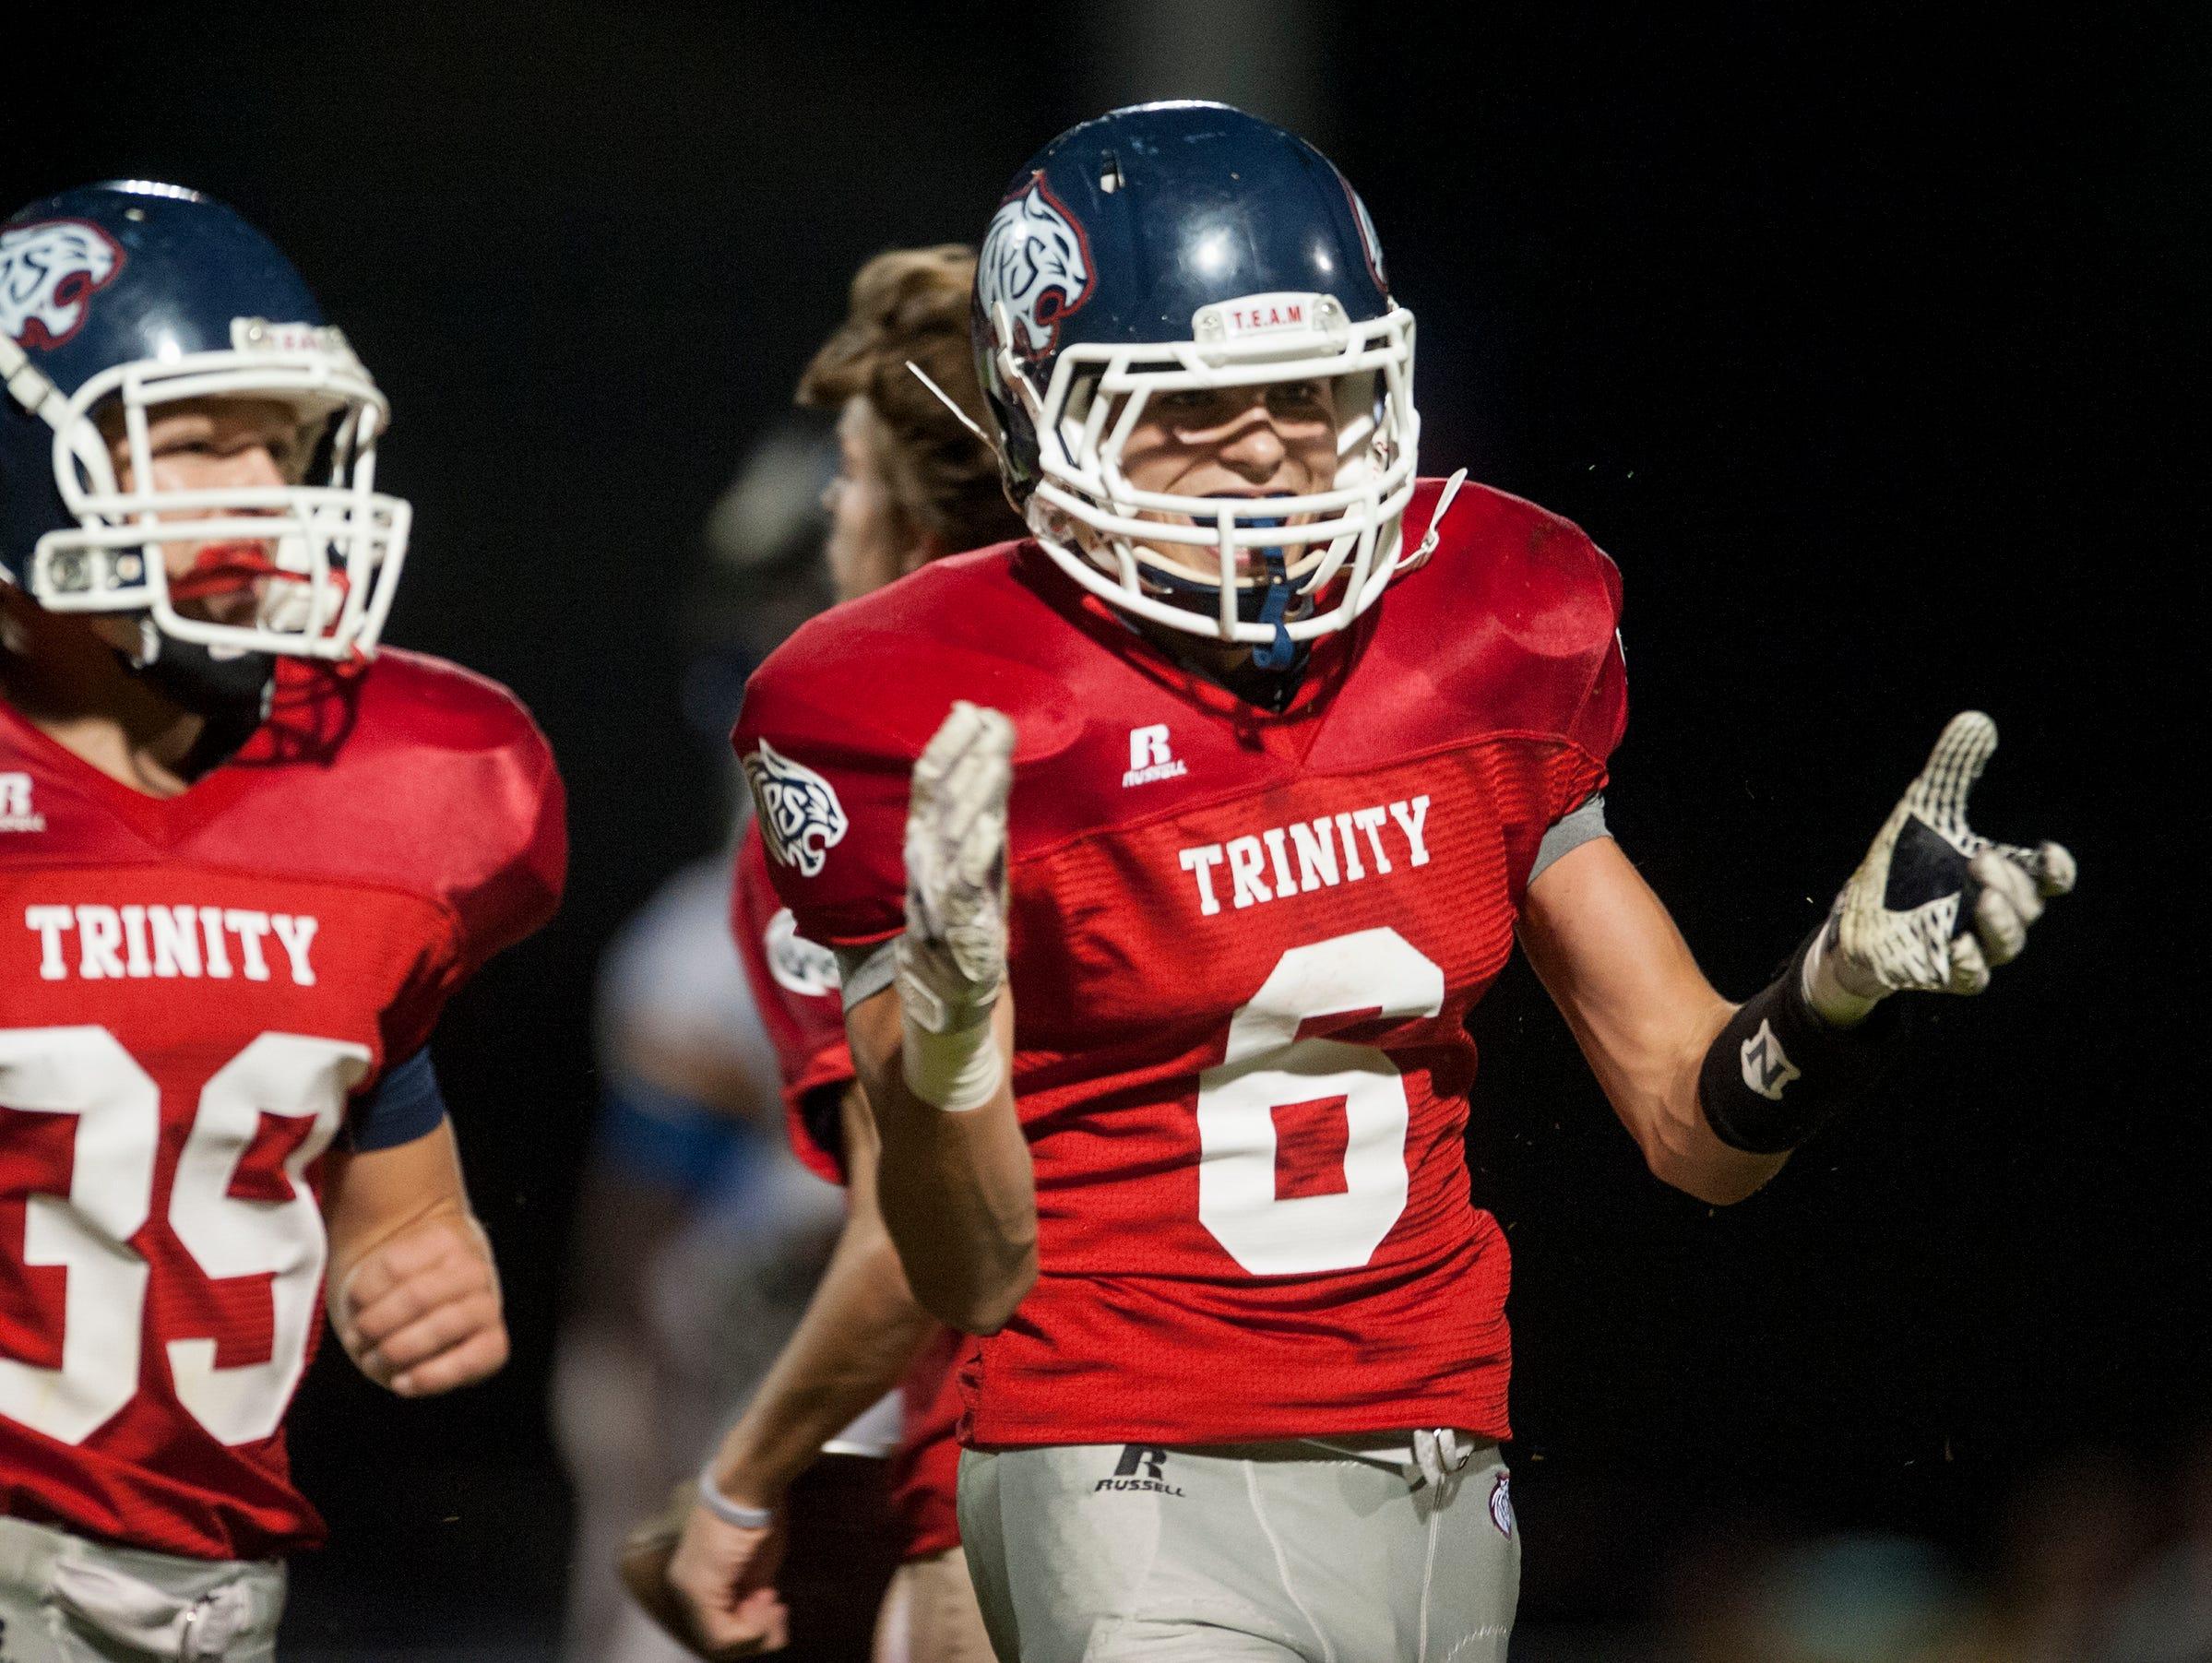 Trinity's Luke Hufham (6) celebrates intercepting a pass against Catholic at the Trinity campus in Montgomery, Ala. on Thursday October 9, 2015.